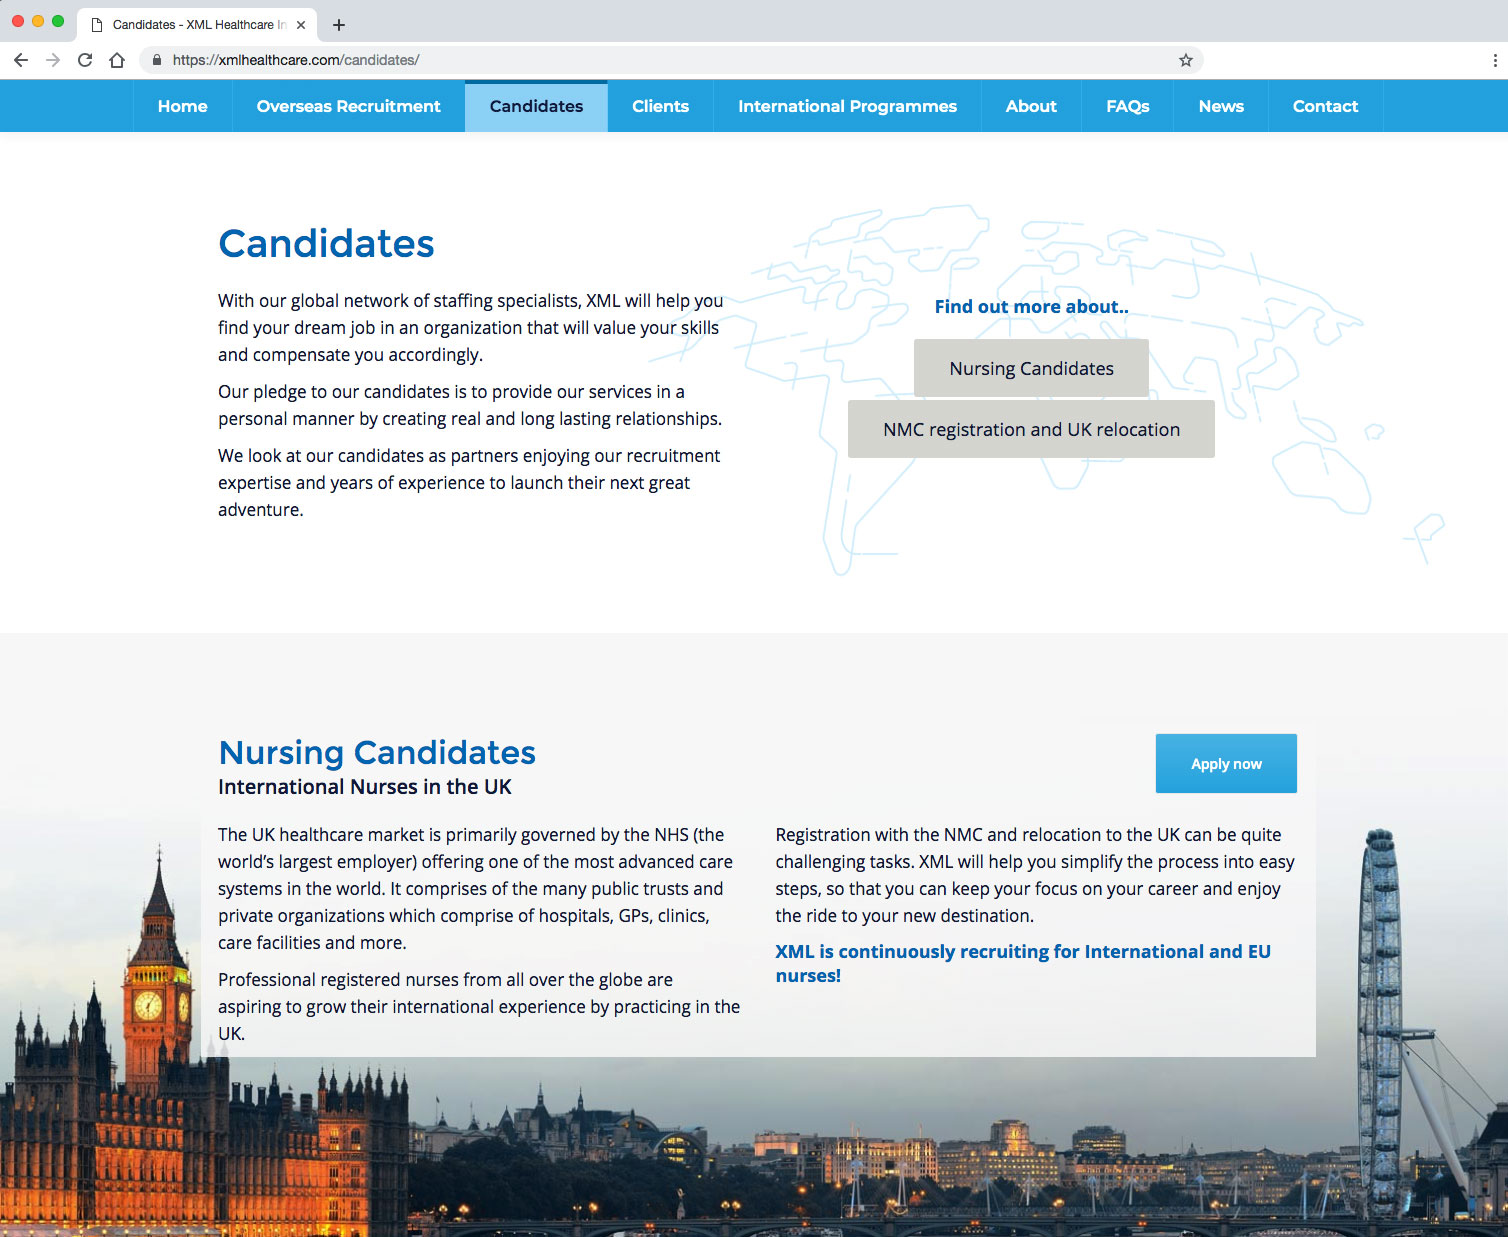 XML Healthcare Candidates